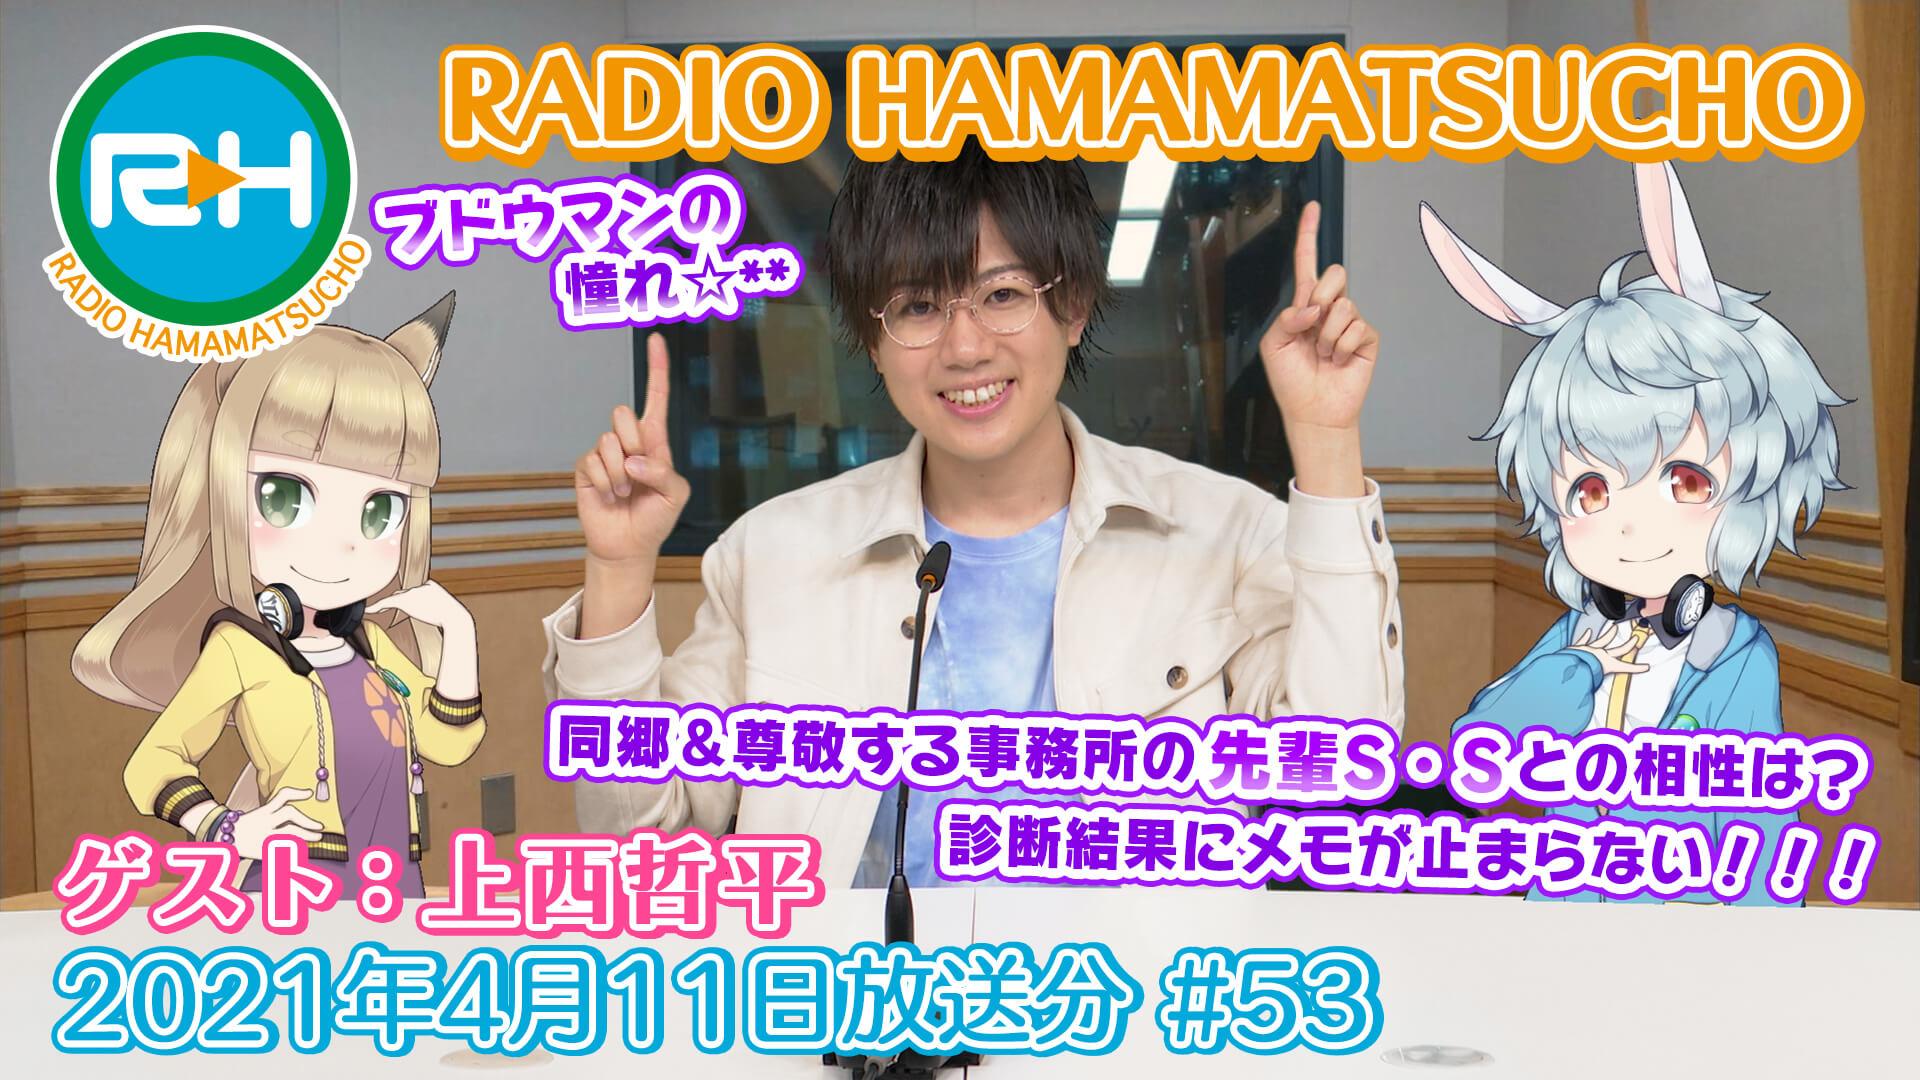 RADIO HAMAMATSUCHO 第53回 (2021年4月11日放送分) ゲスト: 上西哲平